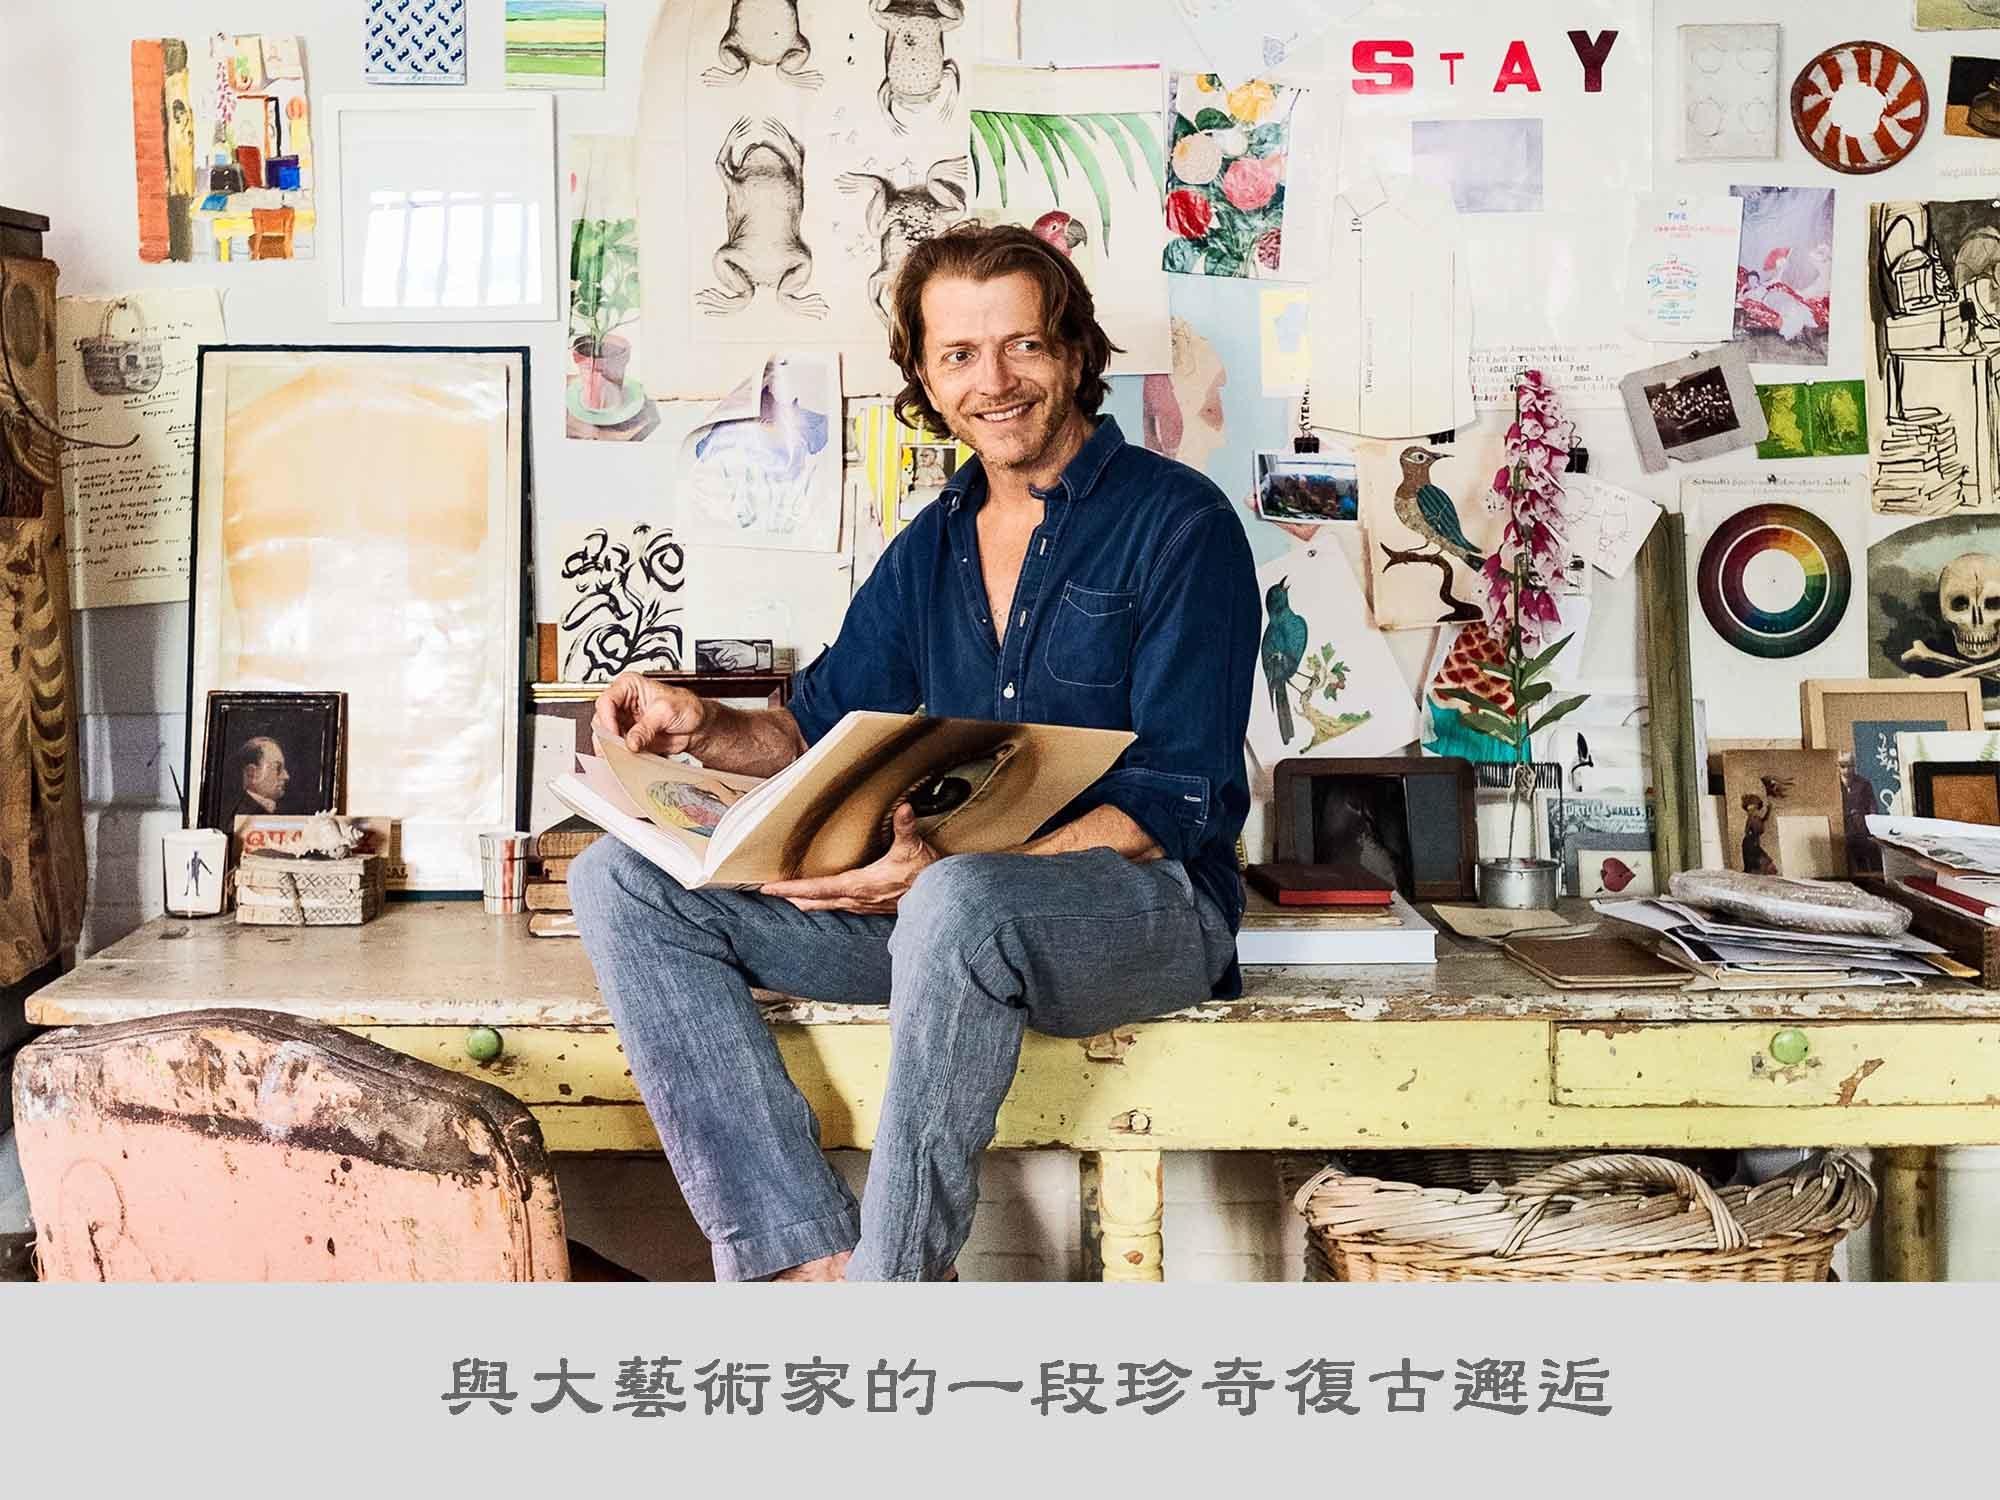 John Derian-美國-紐約品牌-家飾品-拼貼藝術-蝶谷巴特- 居家擺設-器物